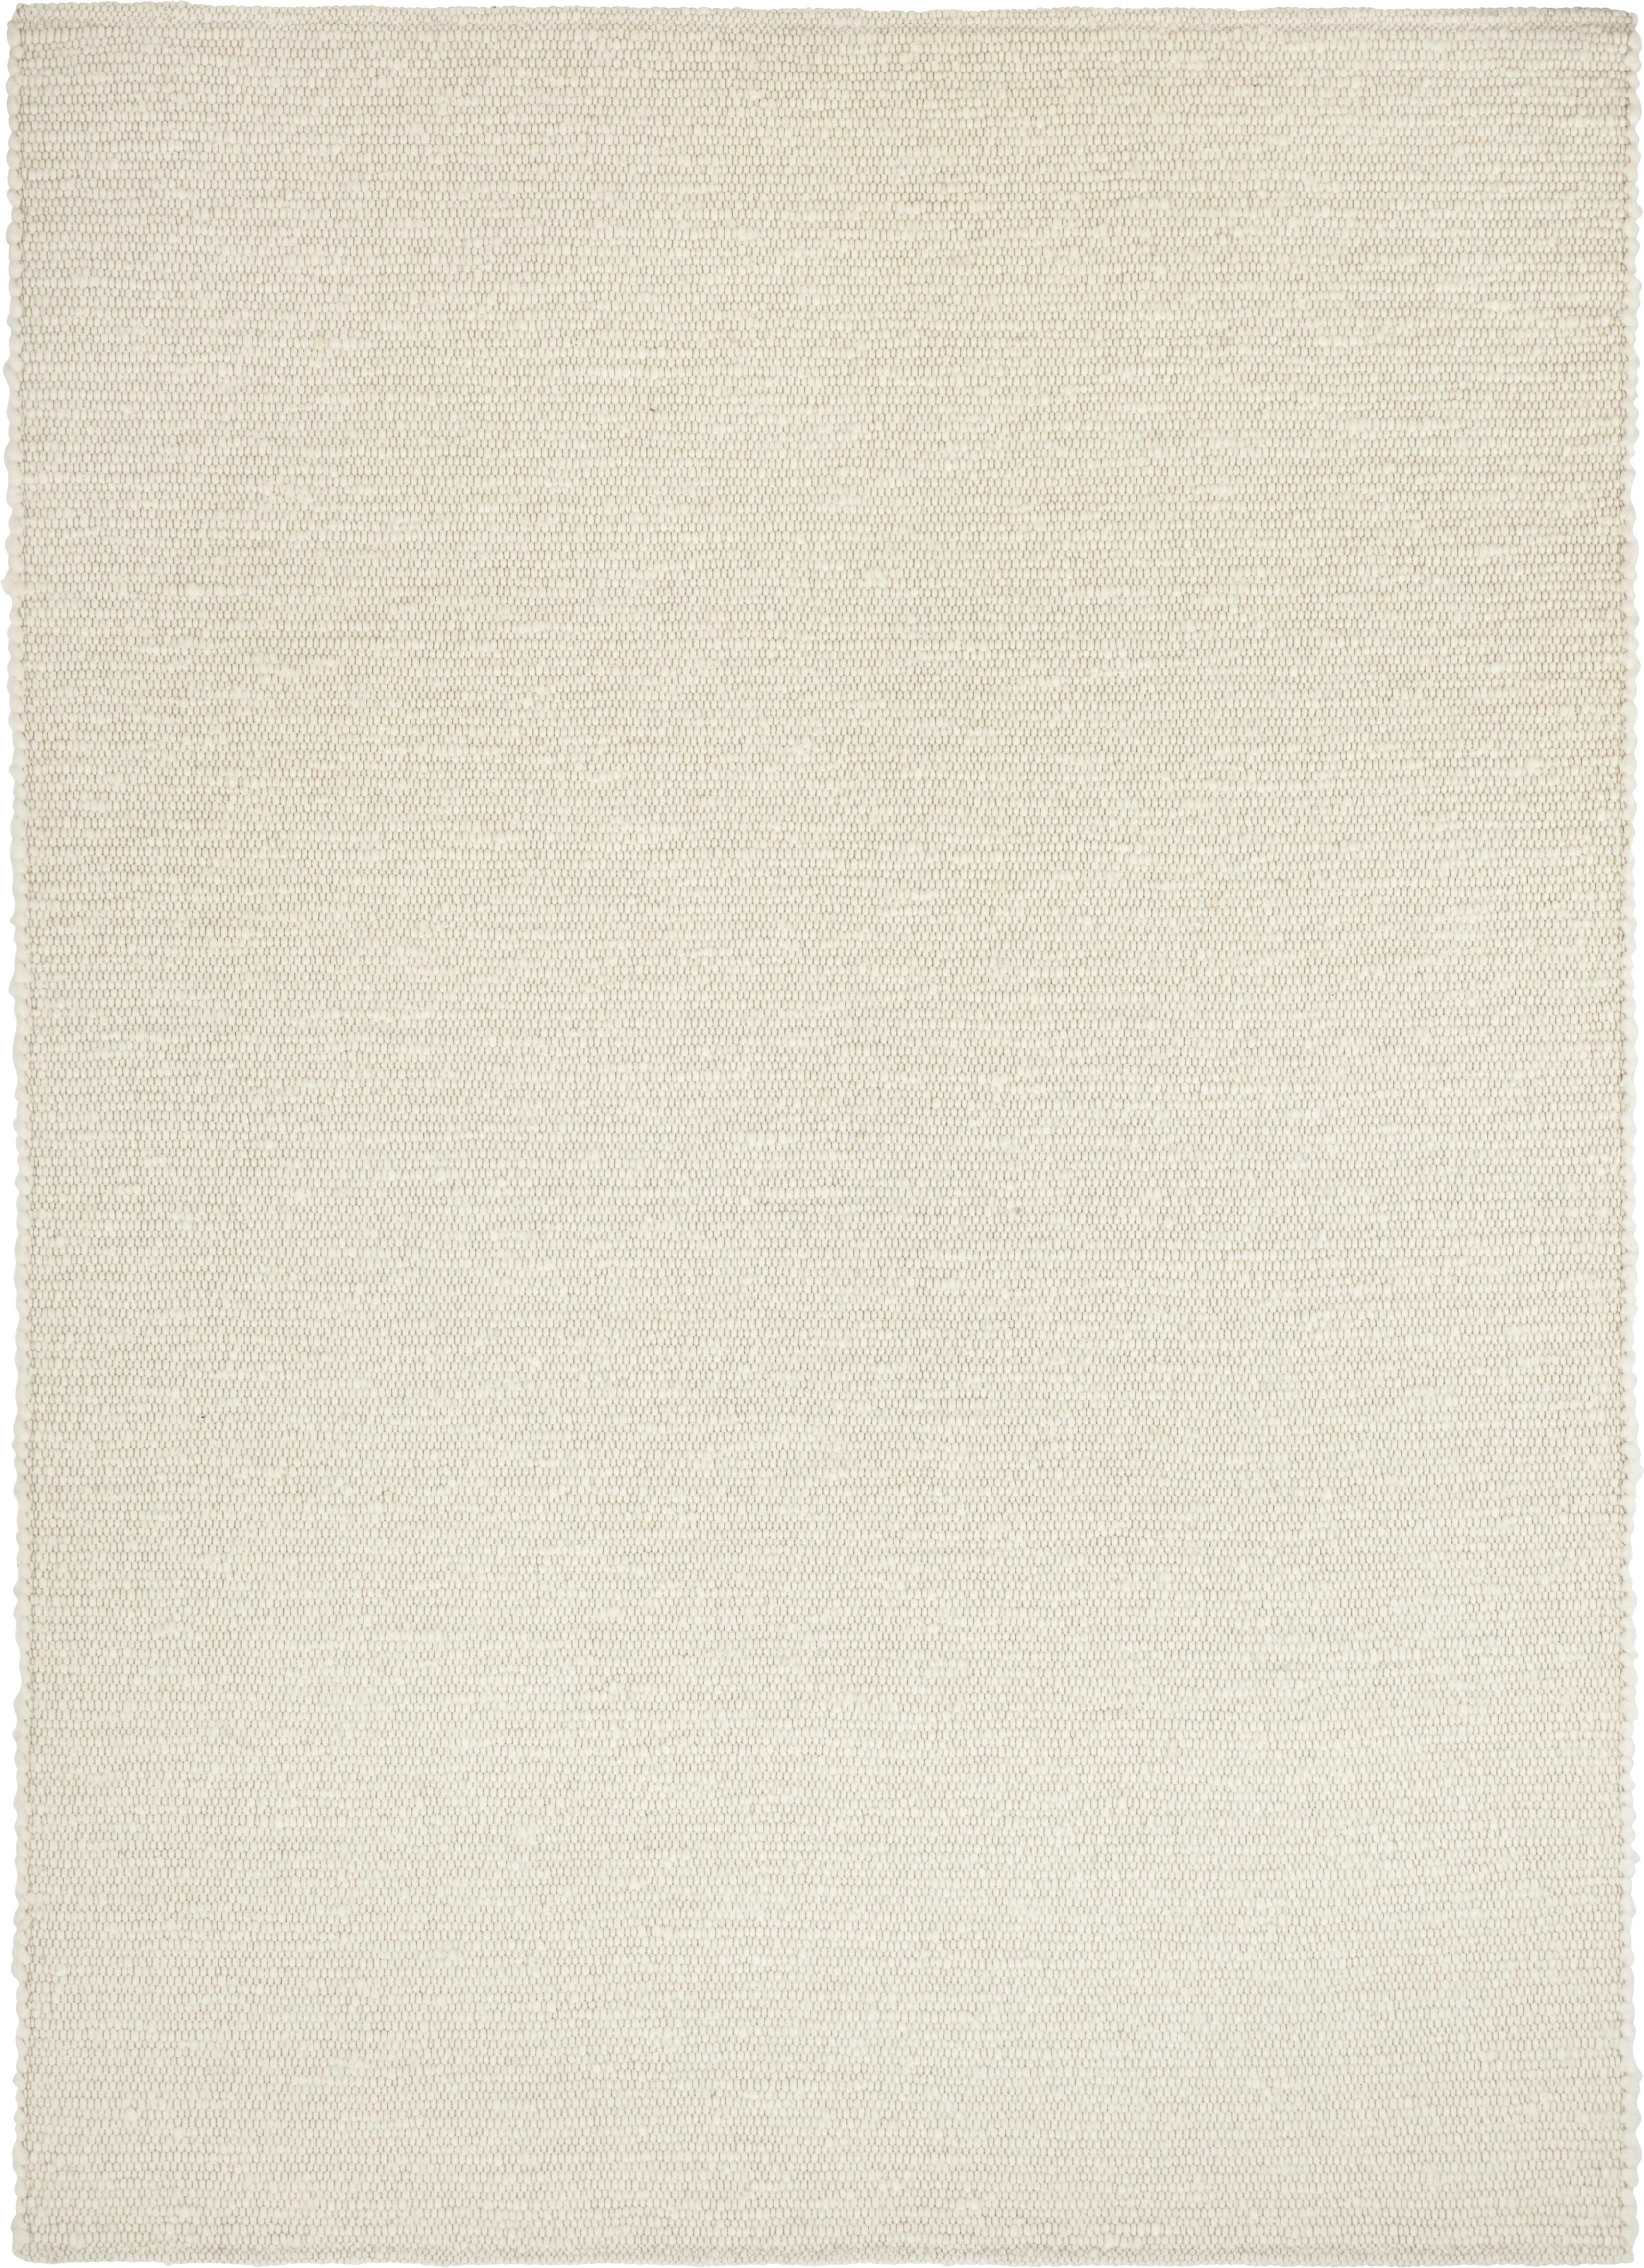 HANDWEBTEPPICH 200/300 cm - KONVENTIONELL (200/300cm) - LINEA NATURA